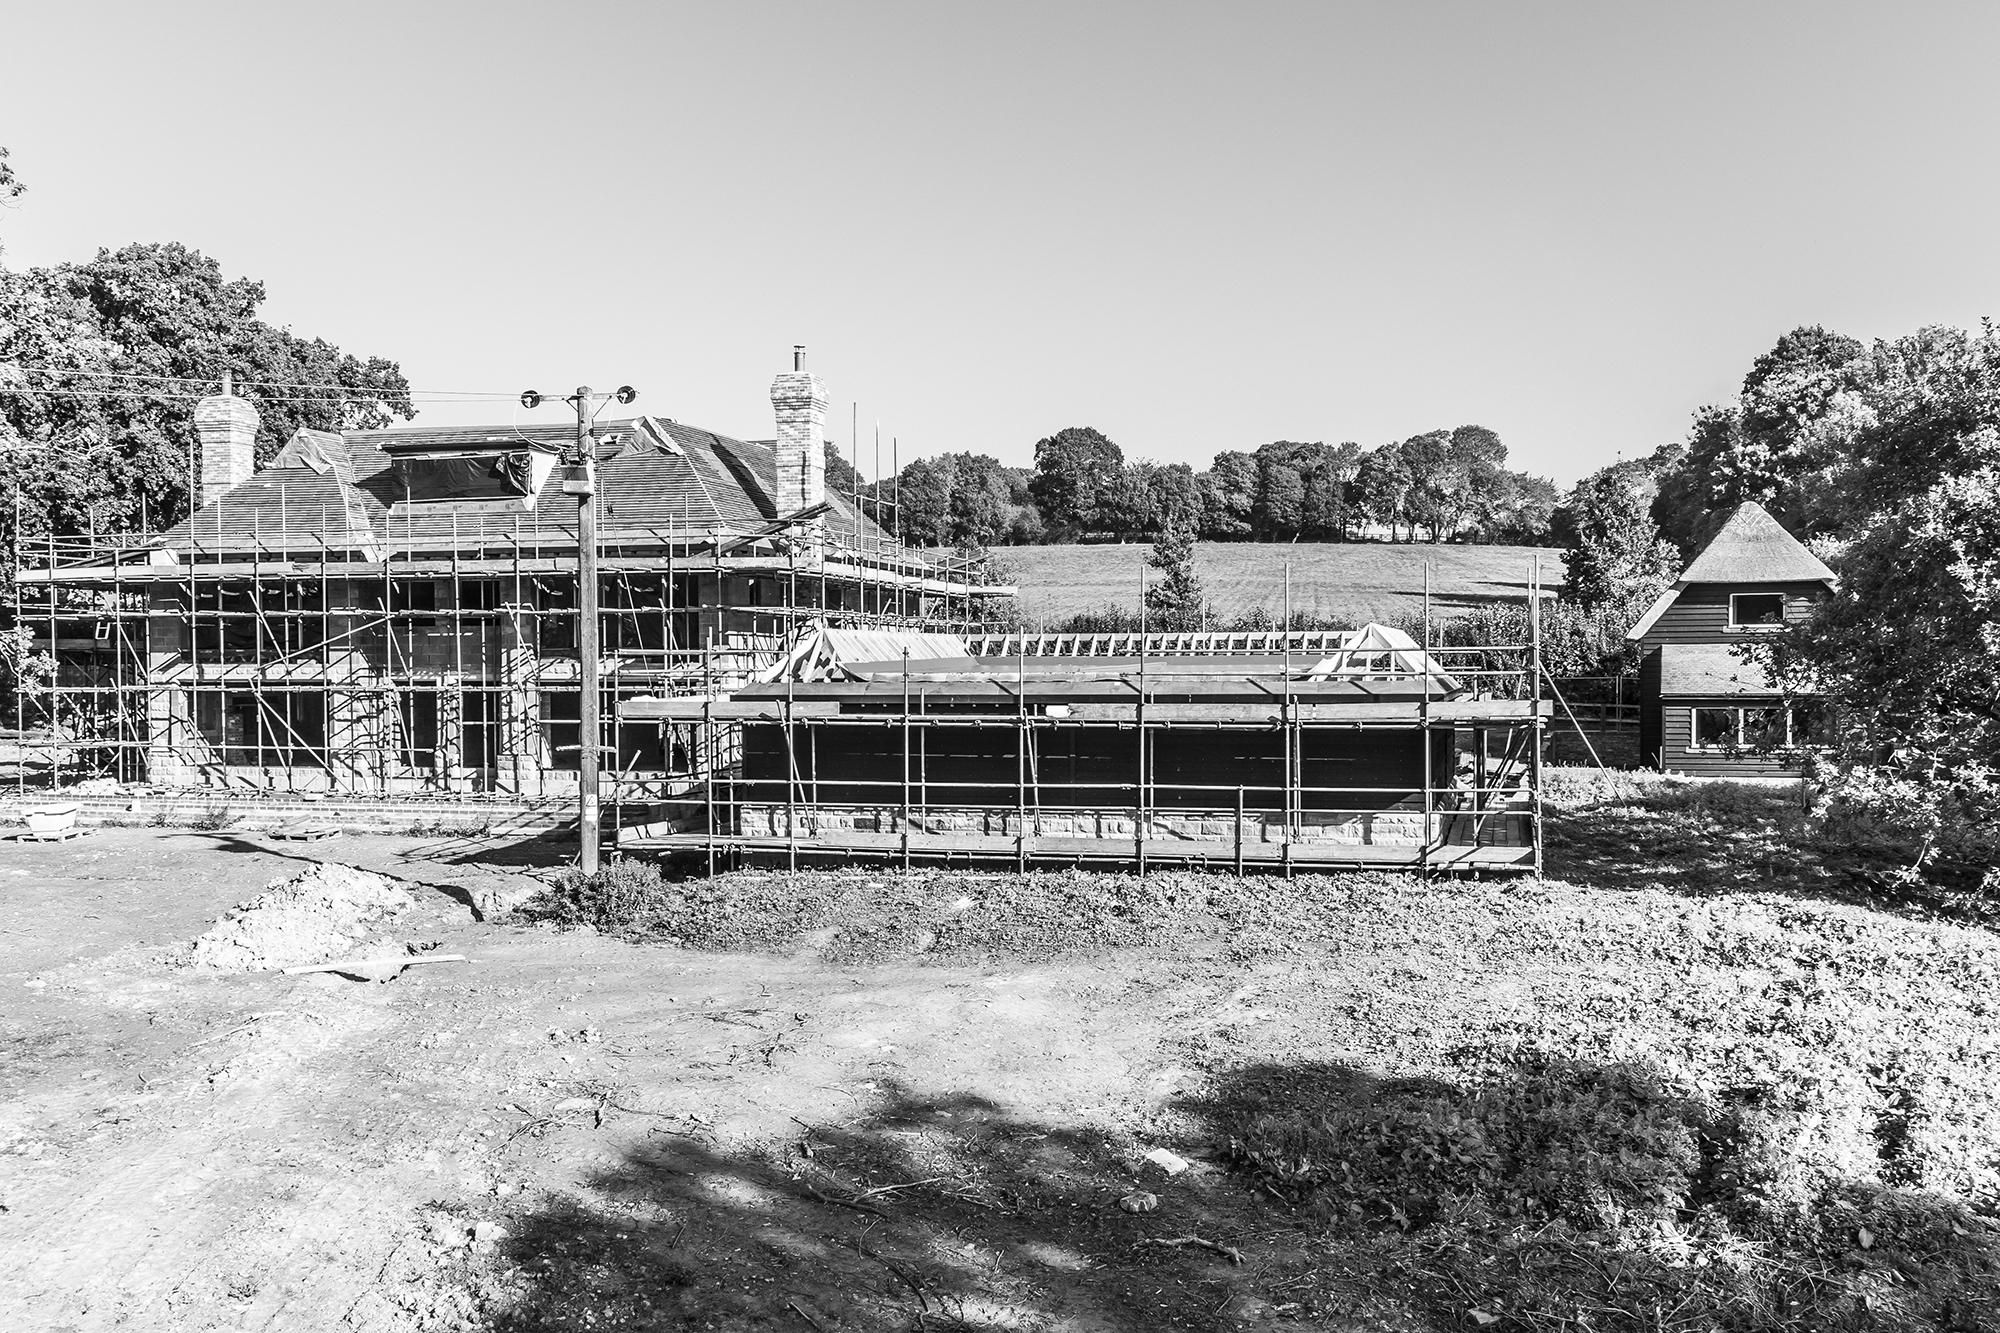 Homefields_Construction2_05.jpg